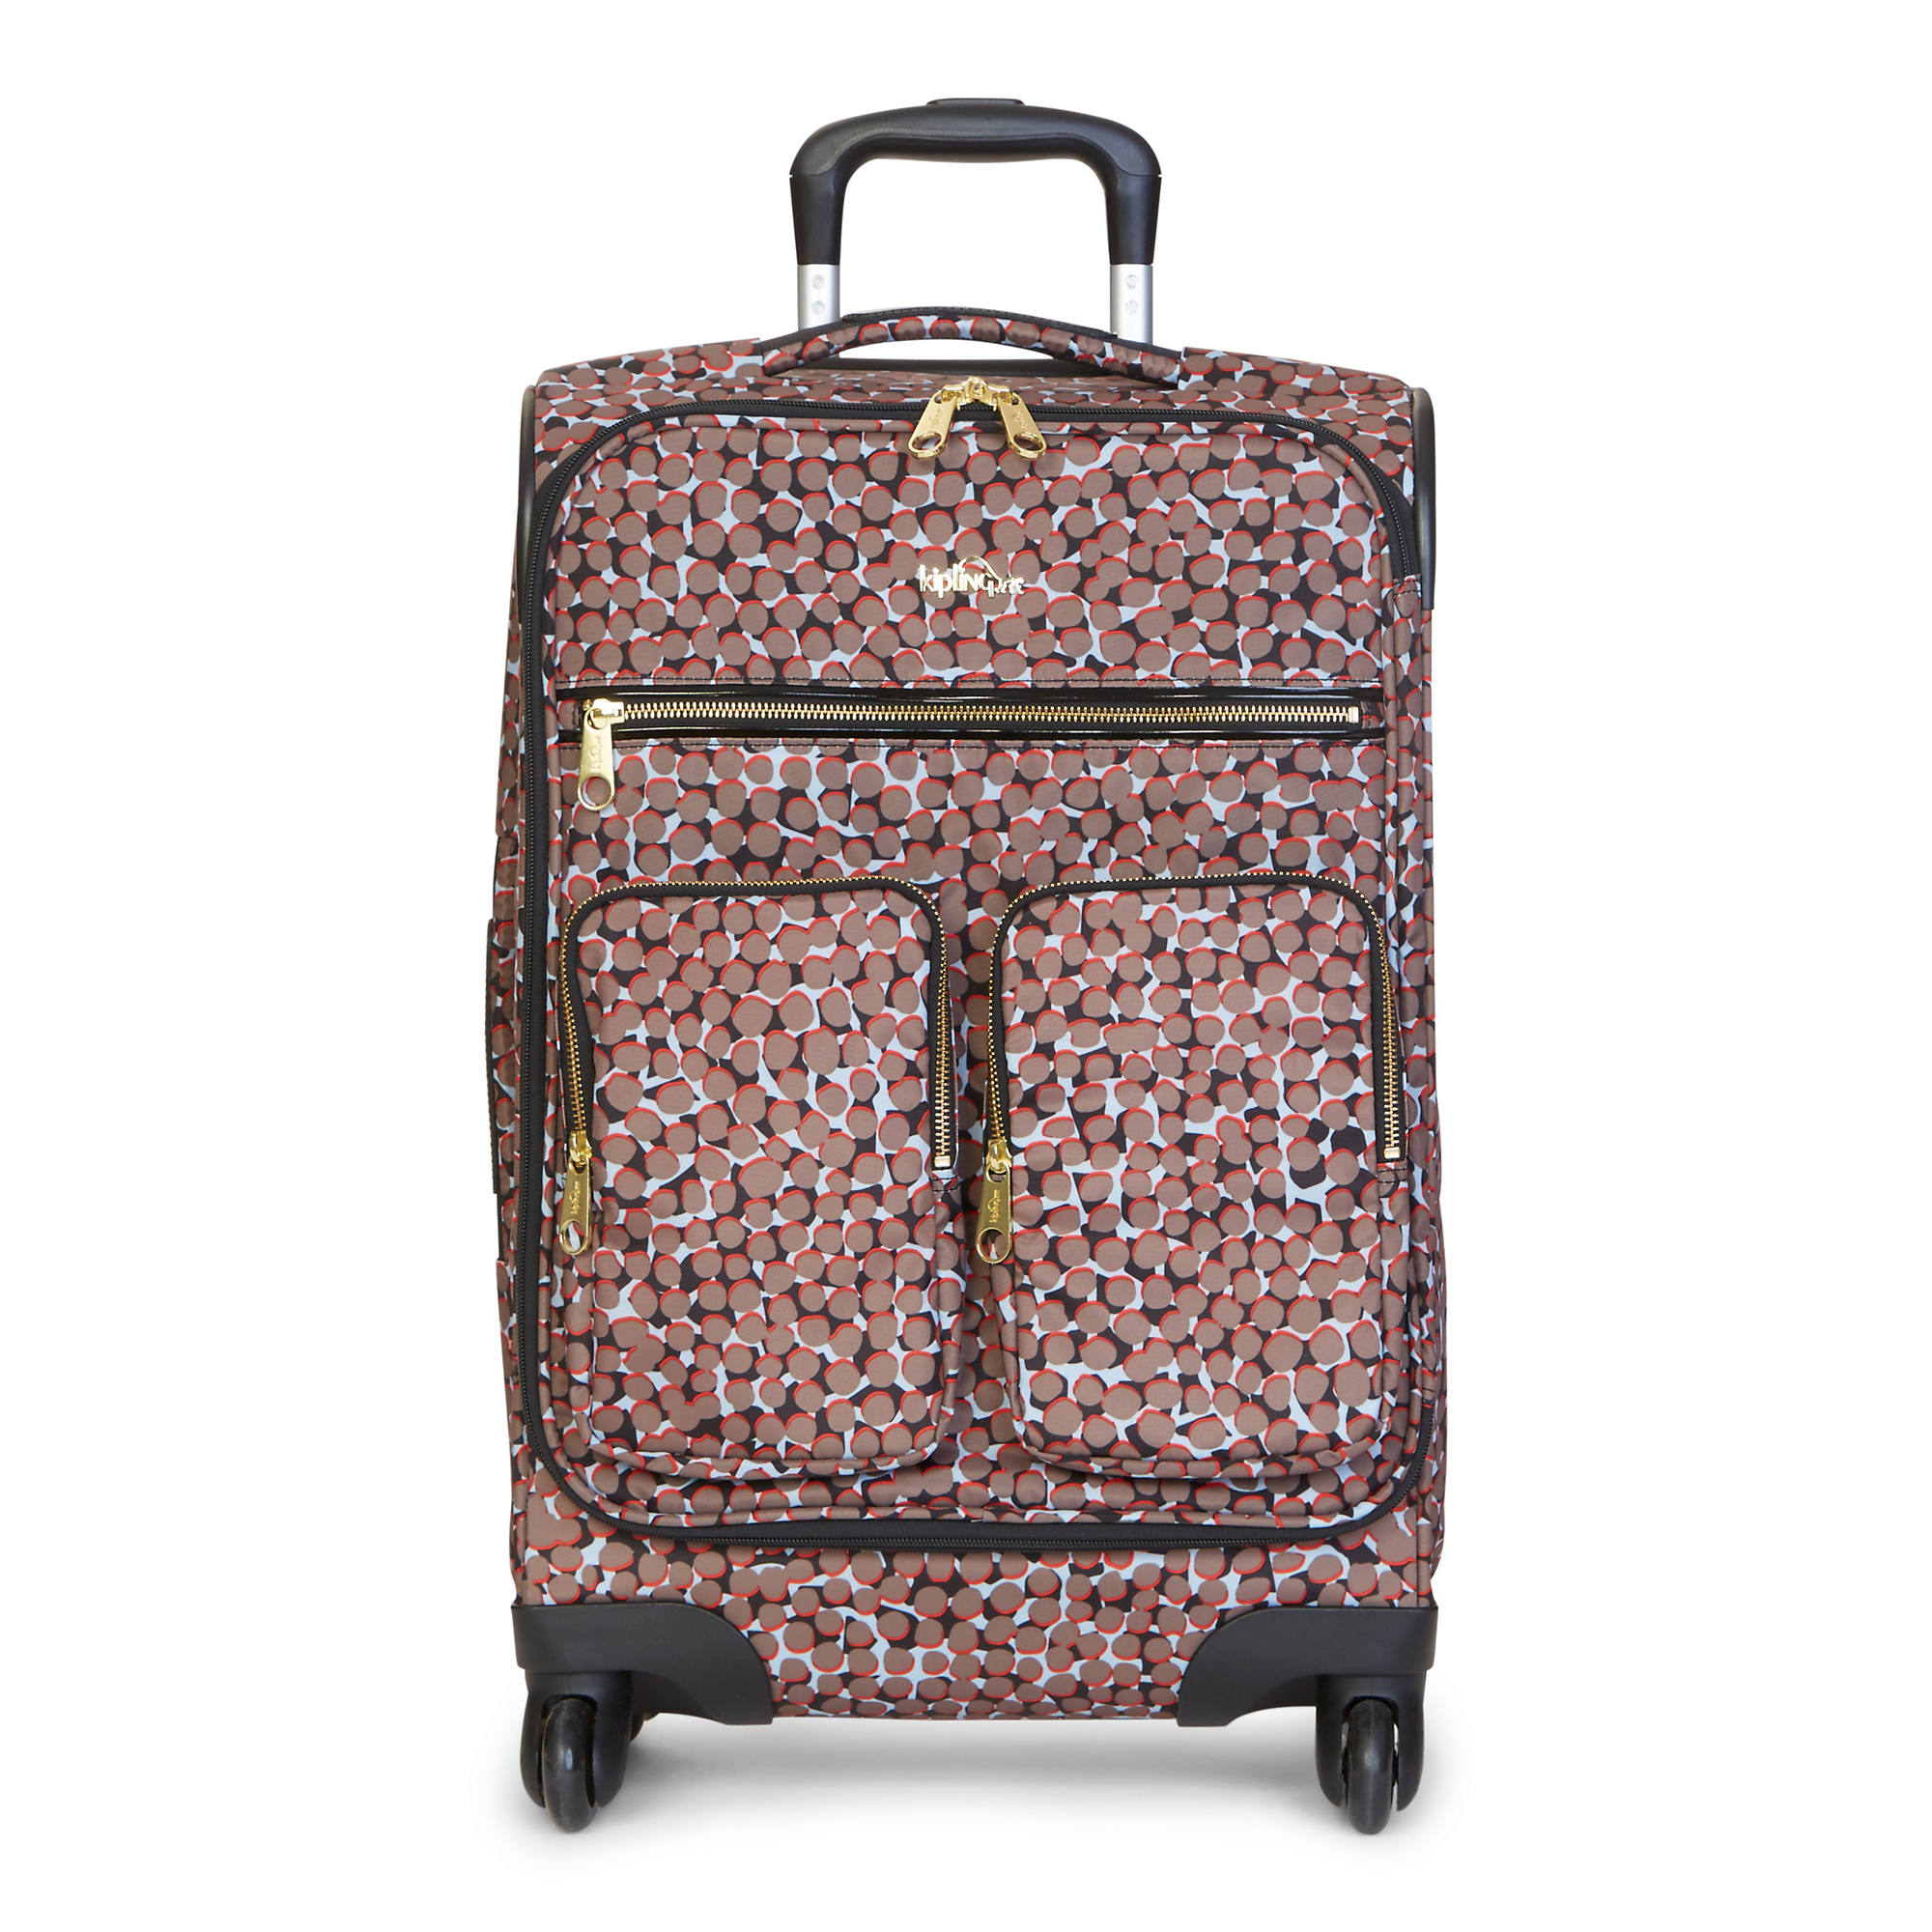 5ed000b3417 Ronan Printed Carry-On Rolling Luggage,Graphic Animal Print,large